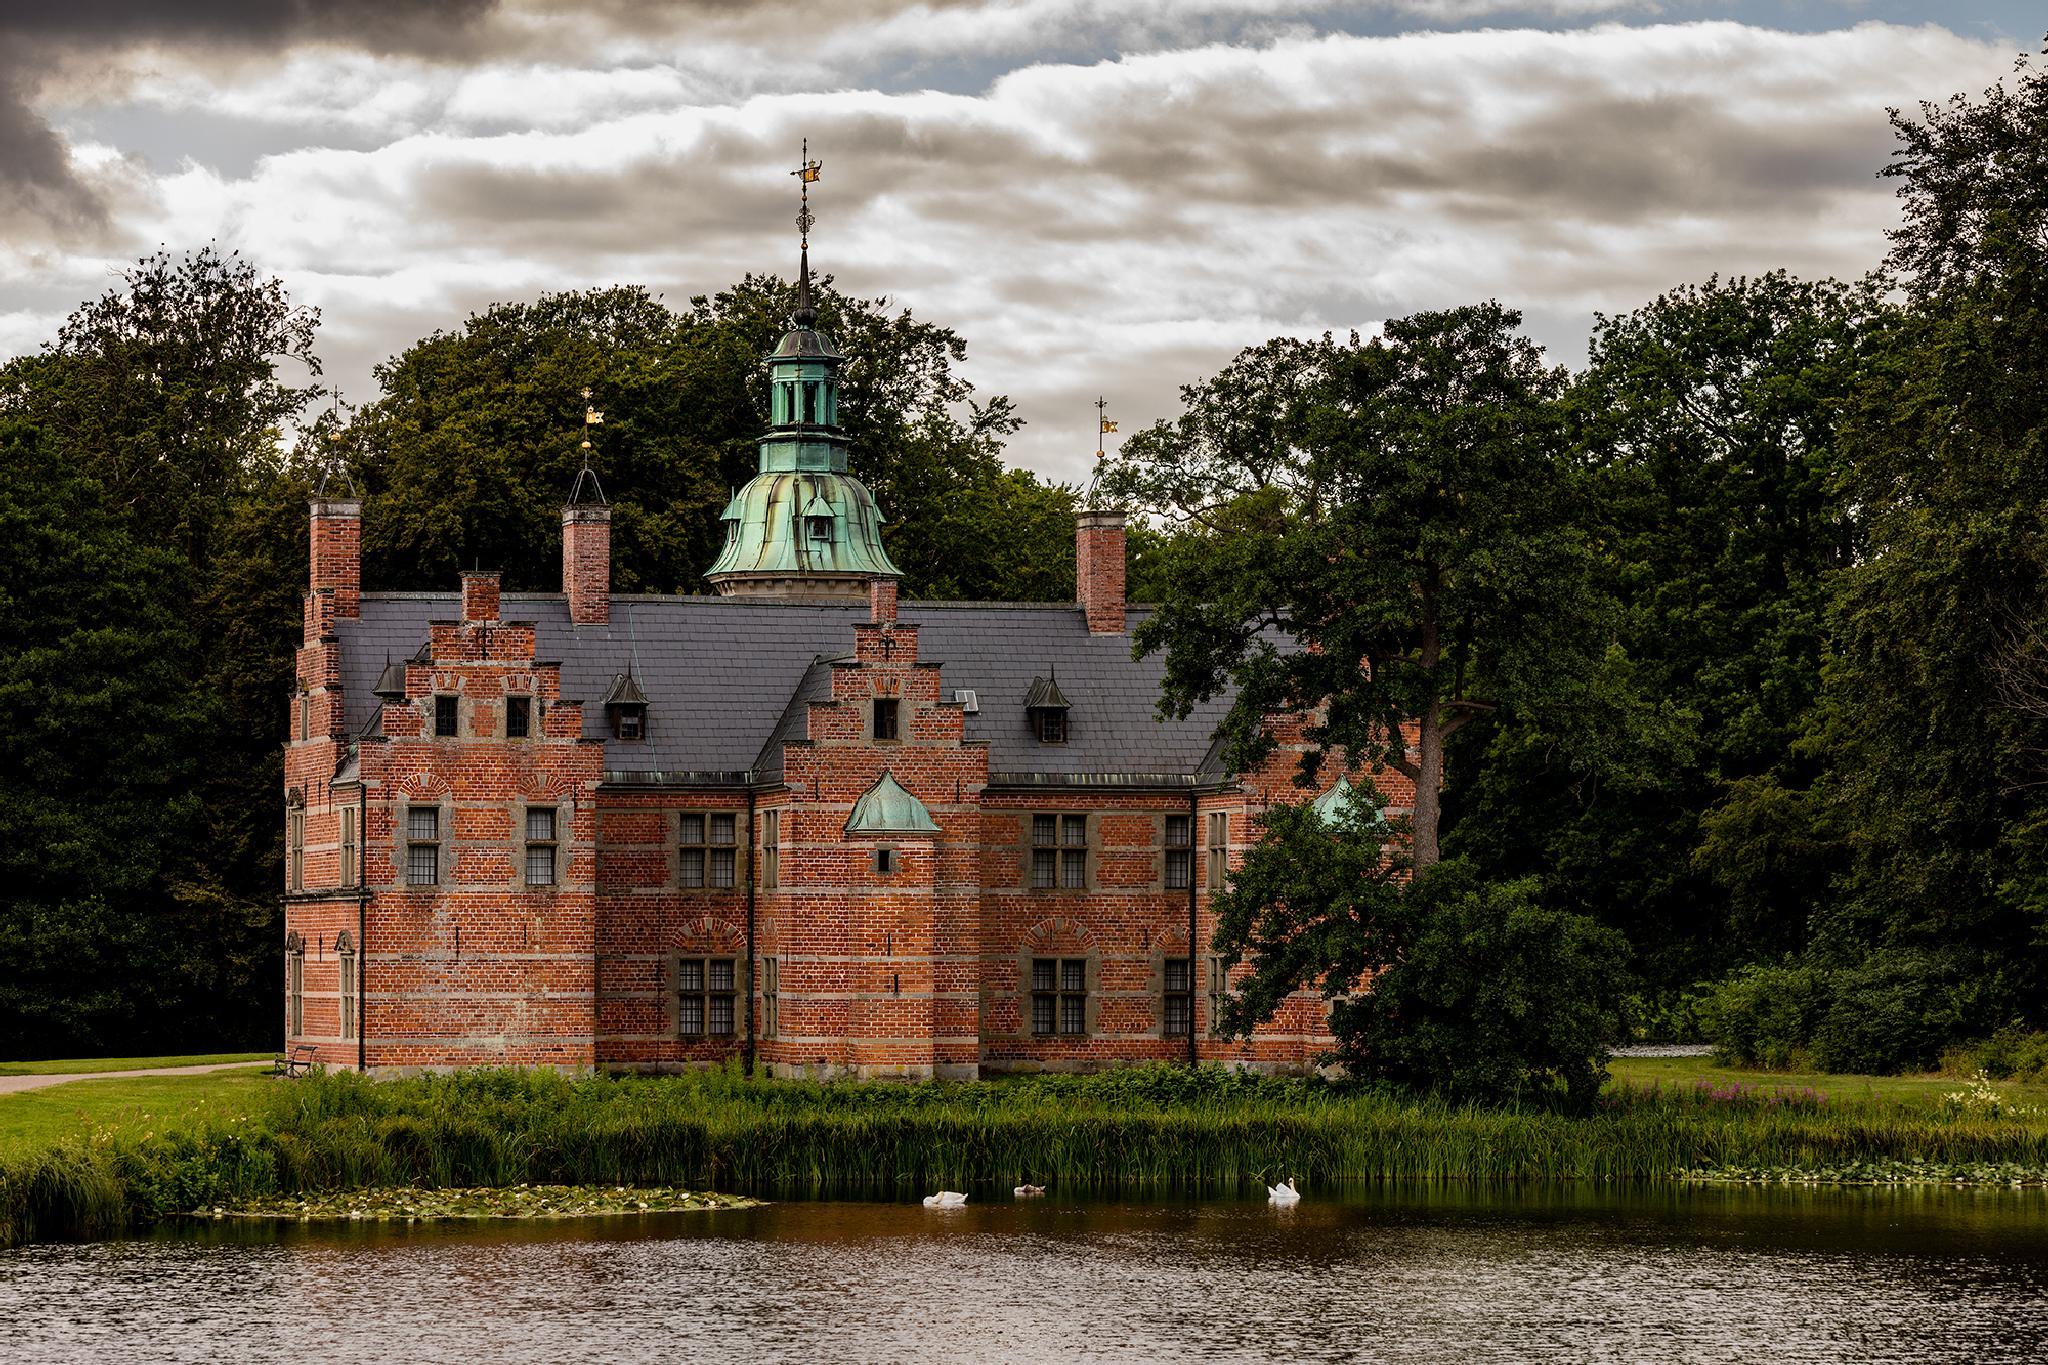 The Bath House of King Frederik II of Denmark by Ruben Blaedel